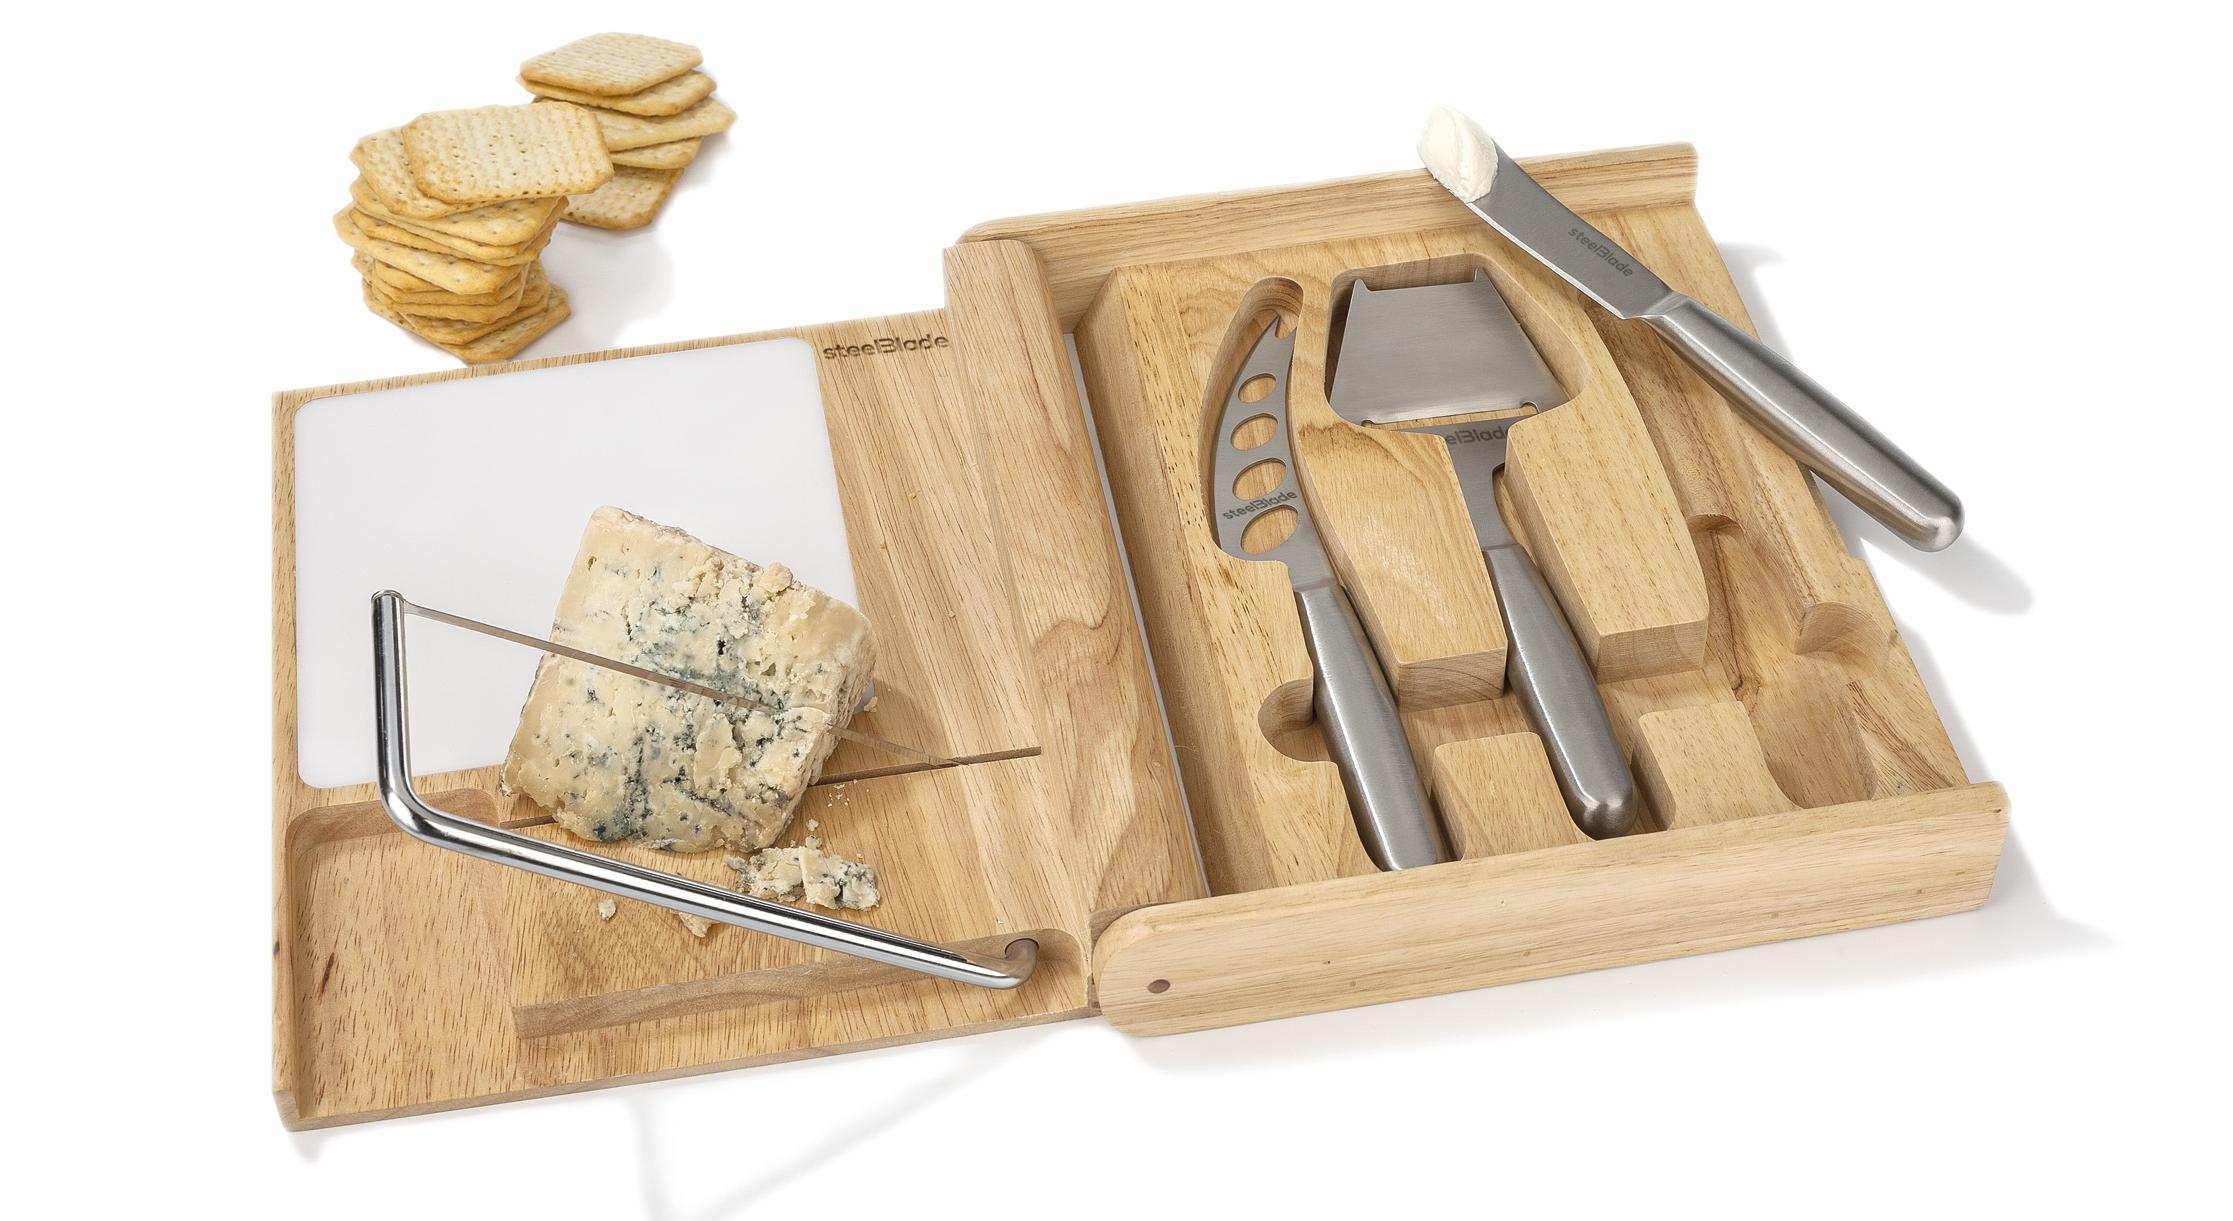 Estuche set de cuchillos para queso y lira steelblade - Cuchillo cortar queso ...